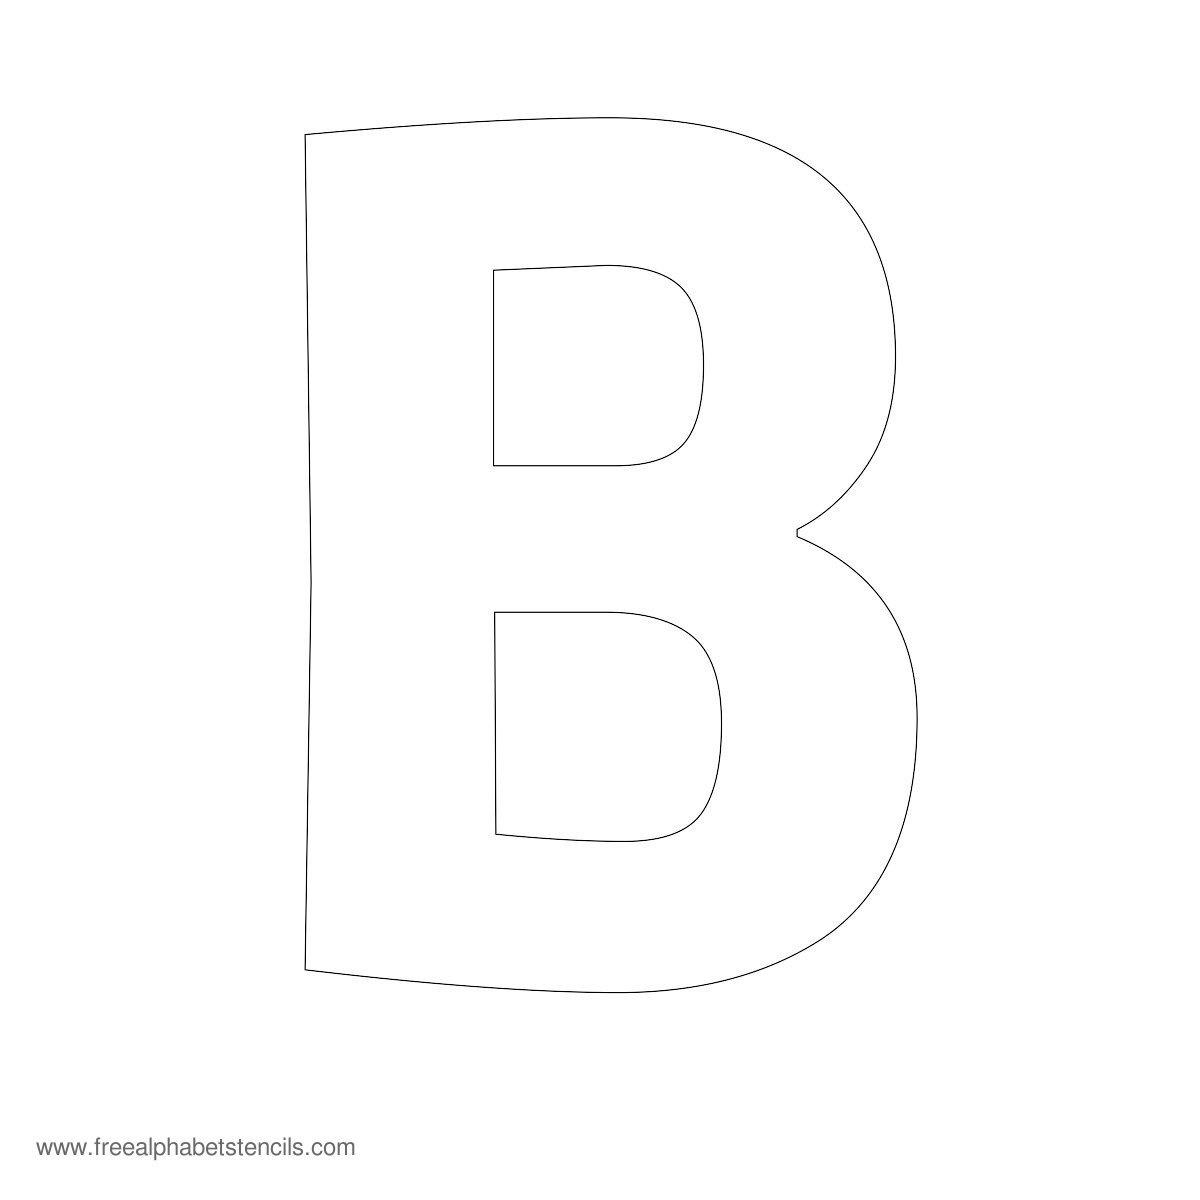 Large Alphabet Stencils | Freealphabetstencils - Free Printable Cut Out Letter Stencils